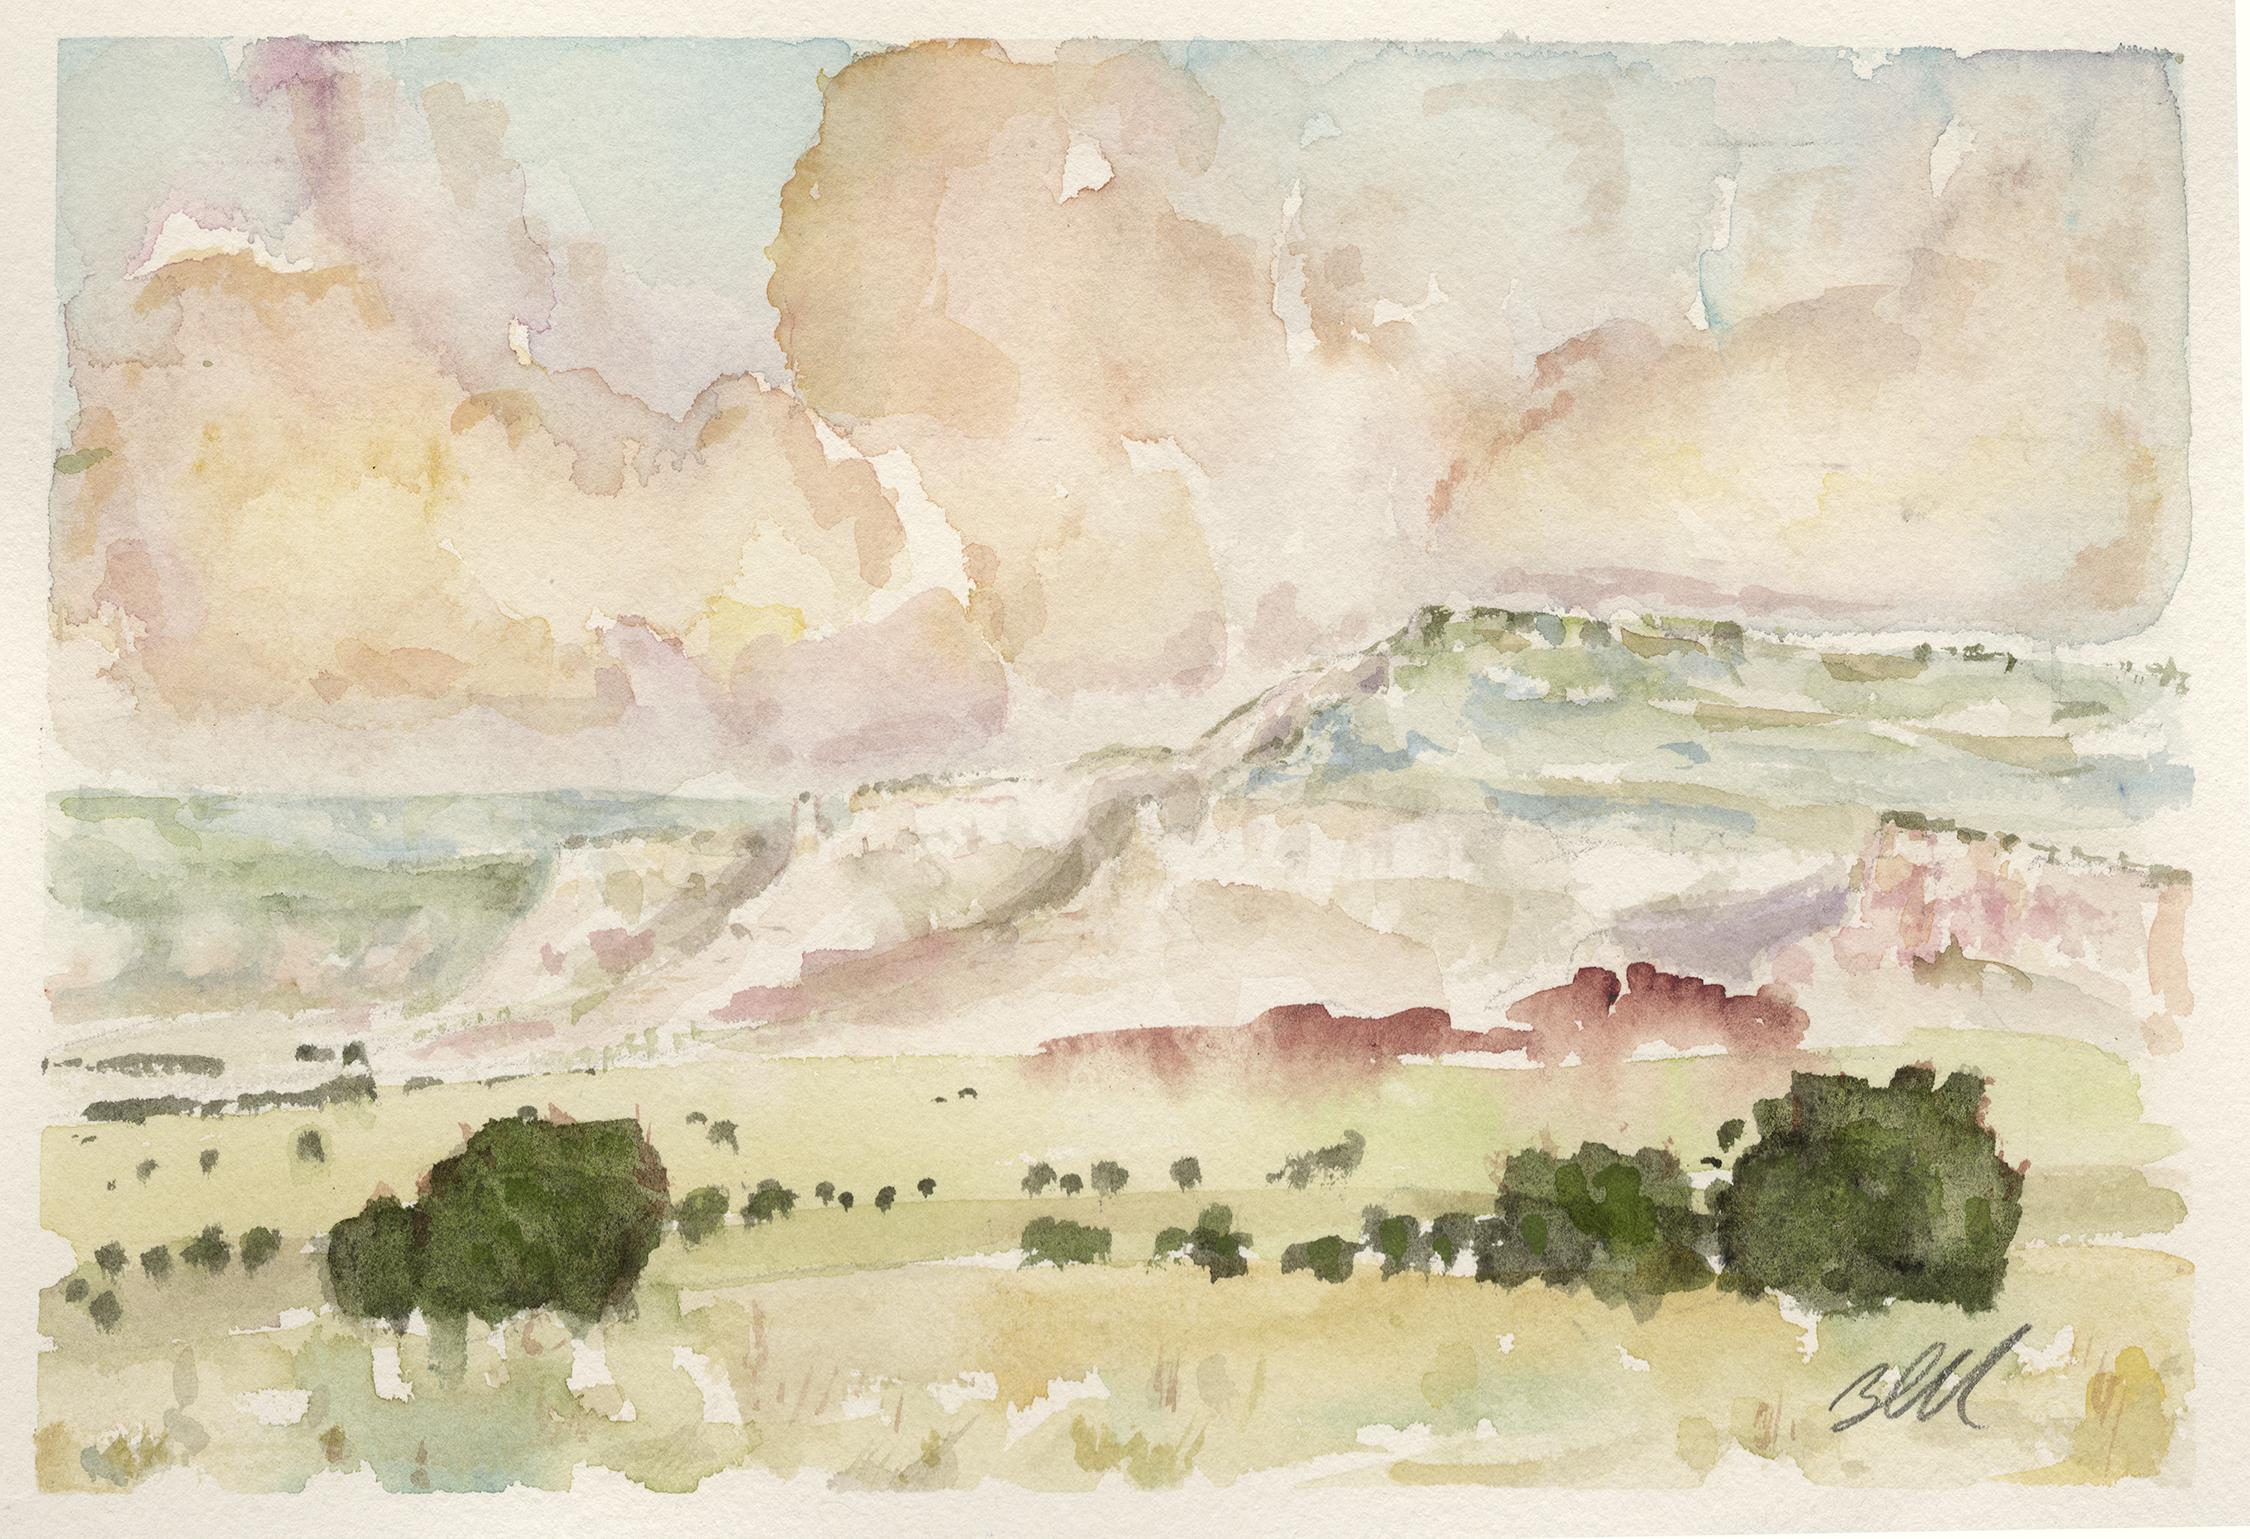 John M. Blanchard, Landscape Study # 1